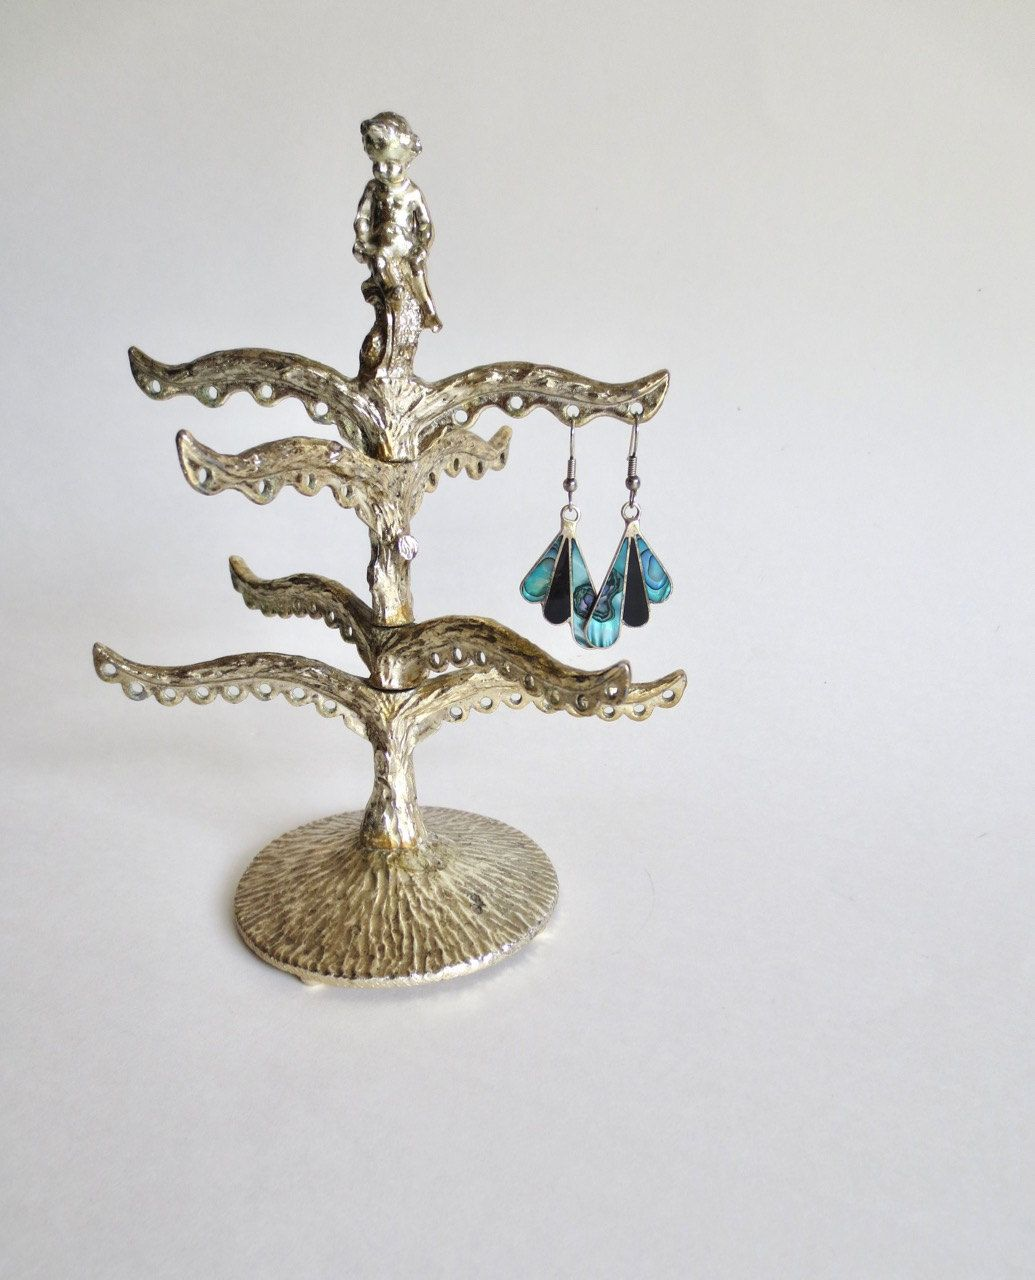 Vintage Earring Holder Vintage Silver Plate Earring Stand Earring Tree Cherub Child Tree Ring Holder Organizer Vintage Silver Earring Stand Vintage Earrings